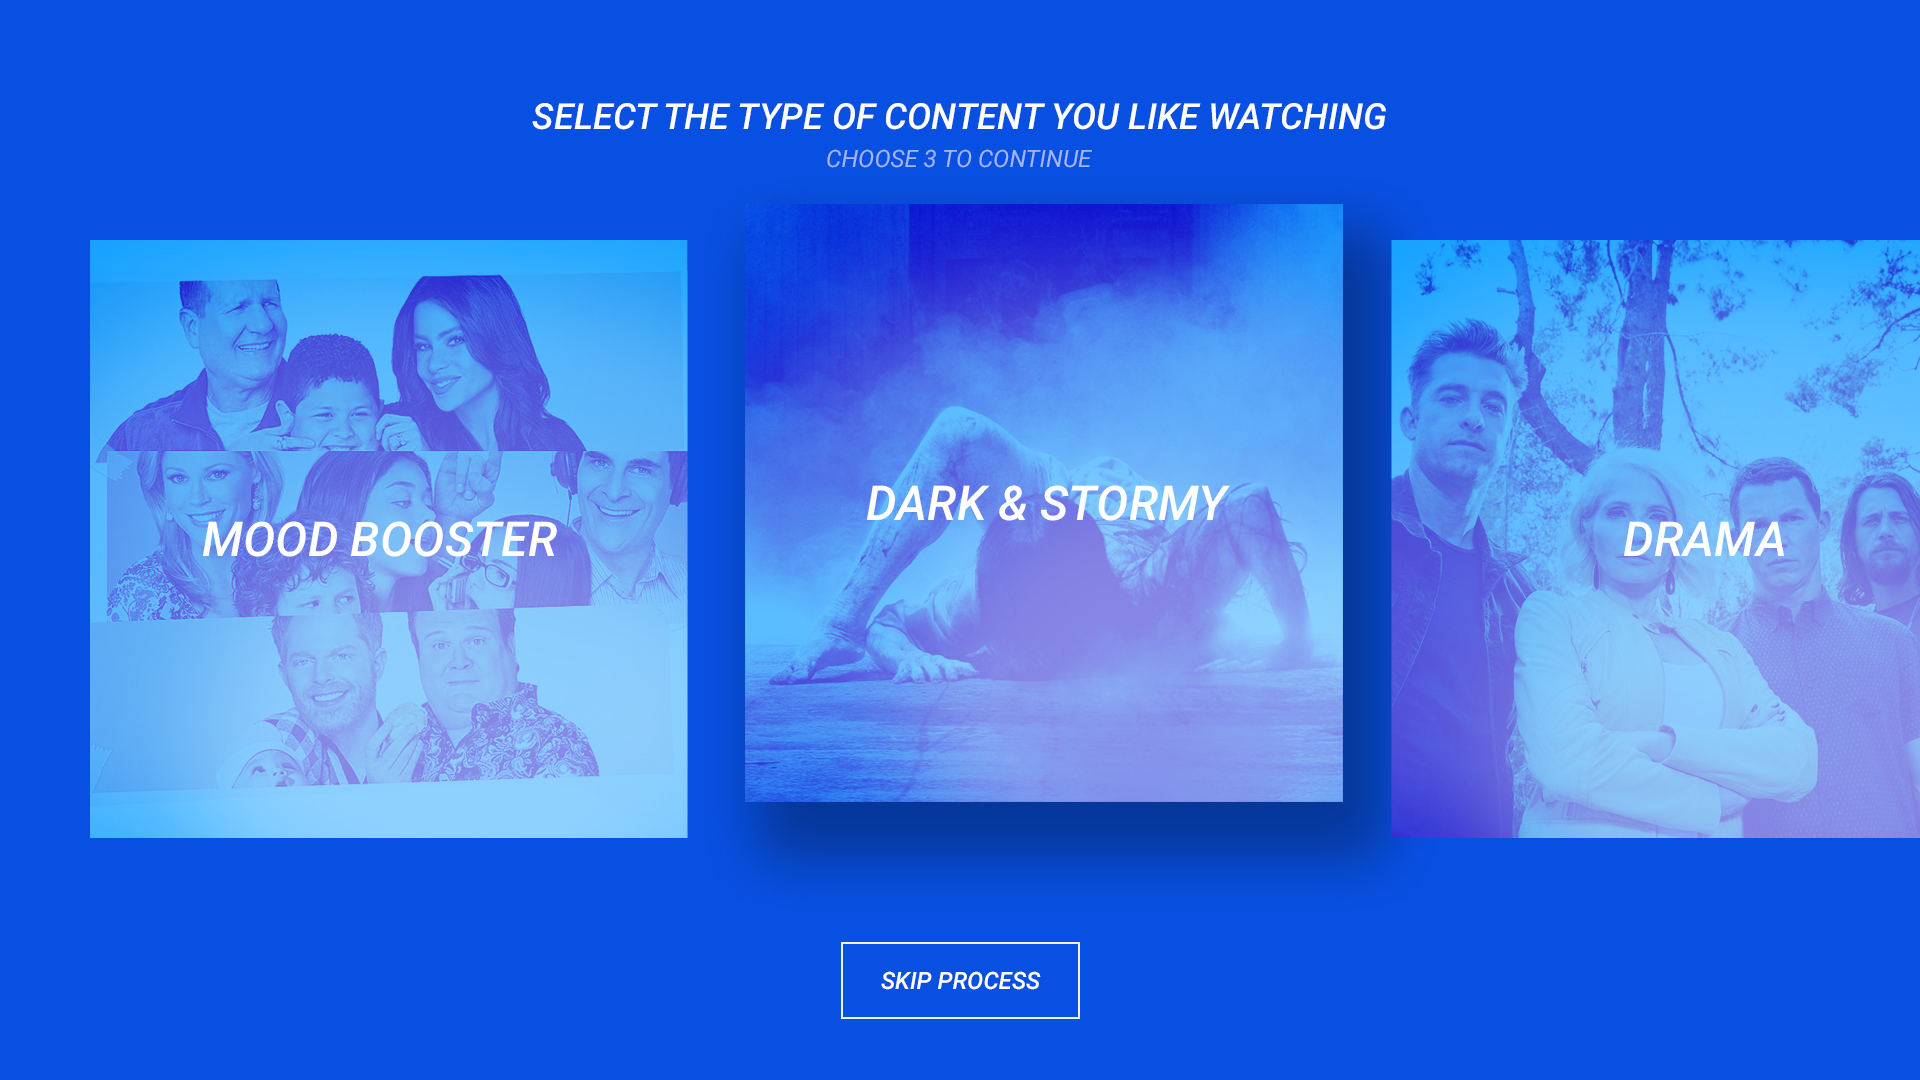 Turner Television User Interface Design for TV